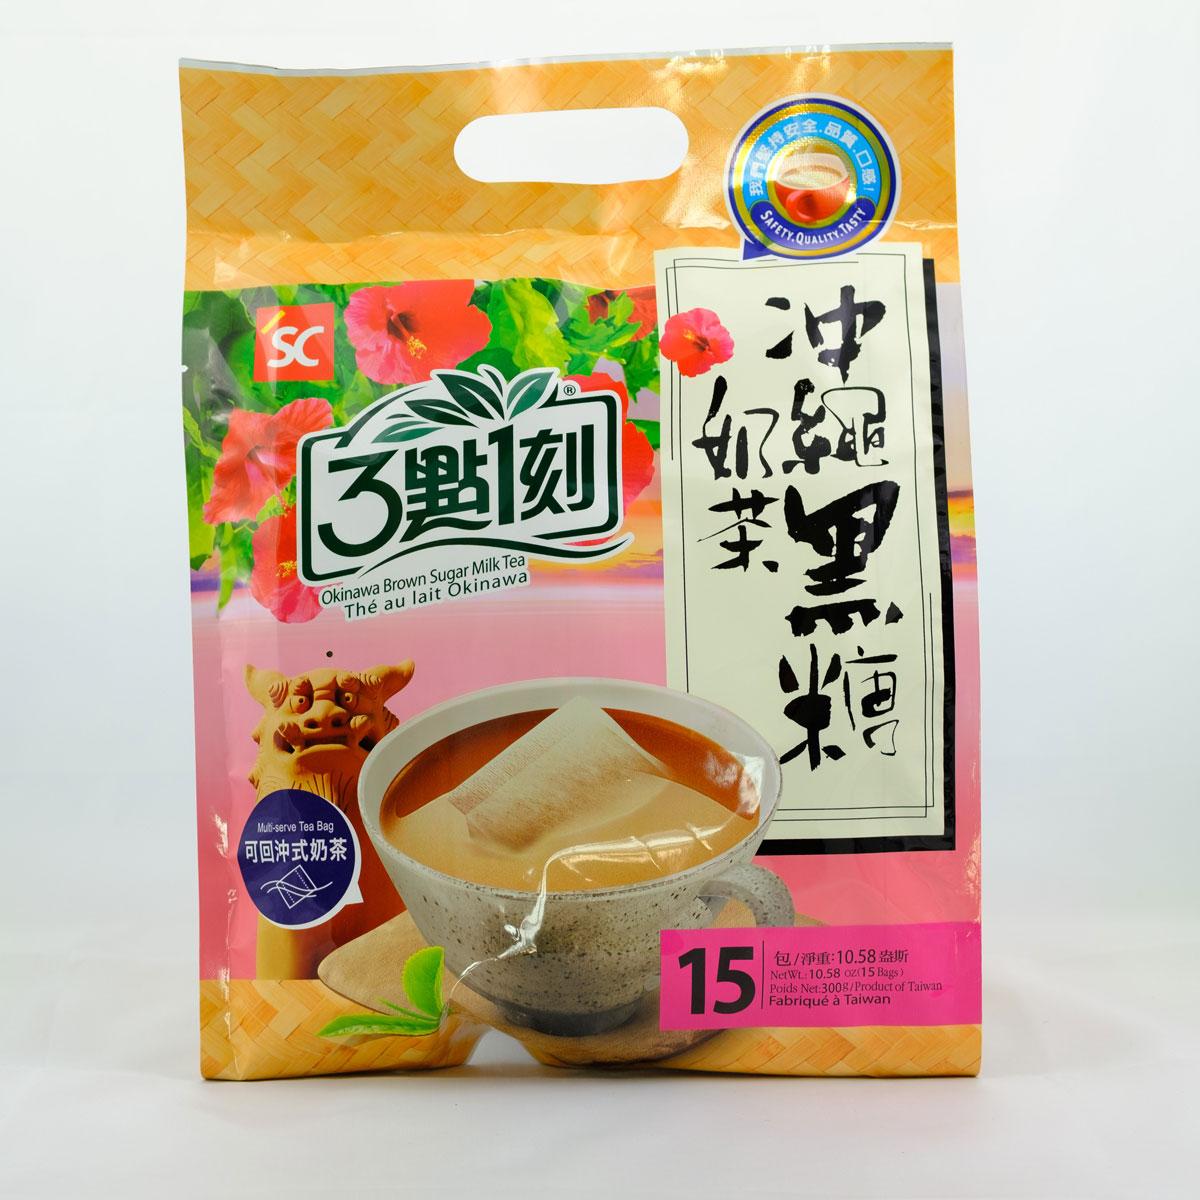 Milk Tea Okinawa Brown Sugar Flavor Bag Sunny Maid